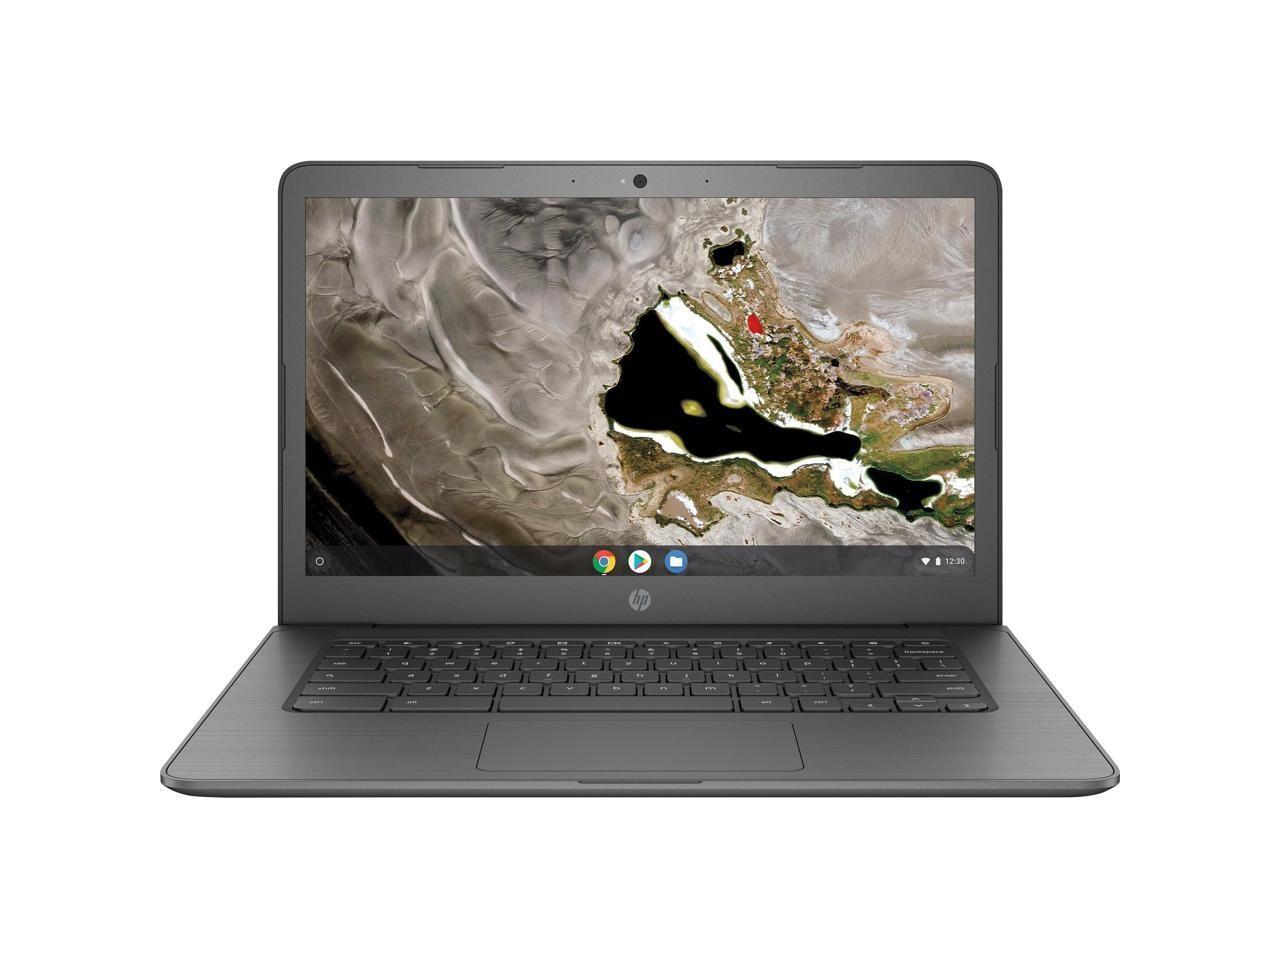 HP 14A G5 AMD A4-9120C 1.6GHz 4GB 16GB Chrome OS Chromebook 7CZ87UT#ABA